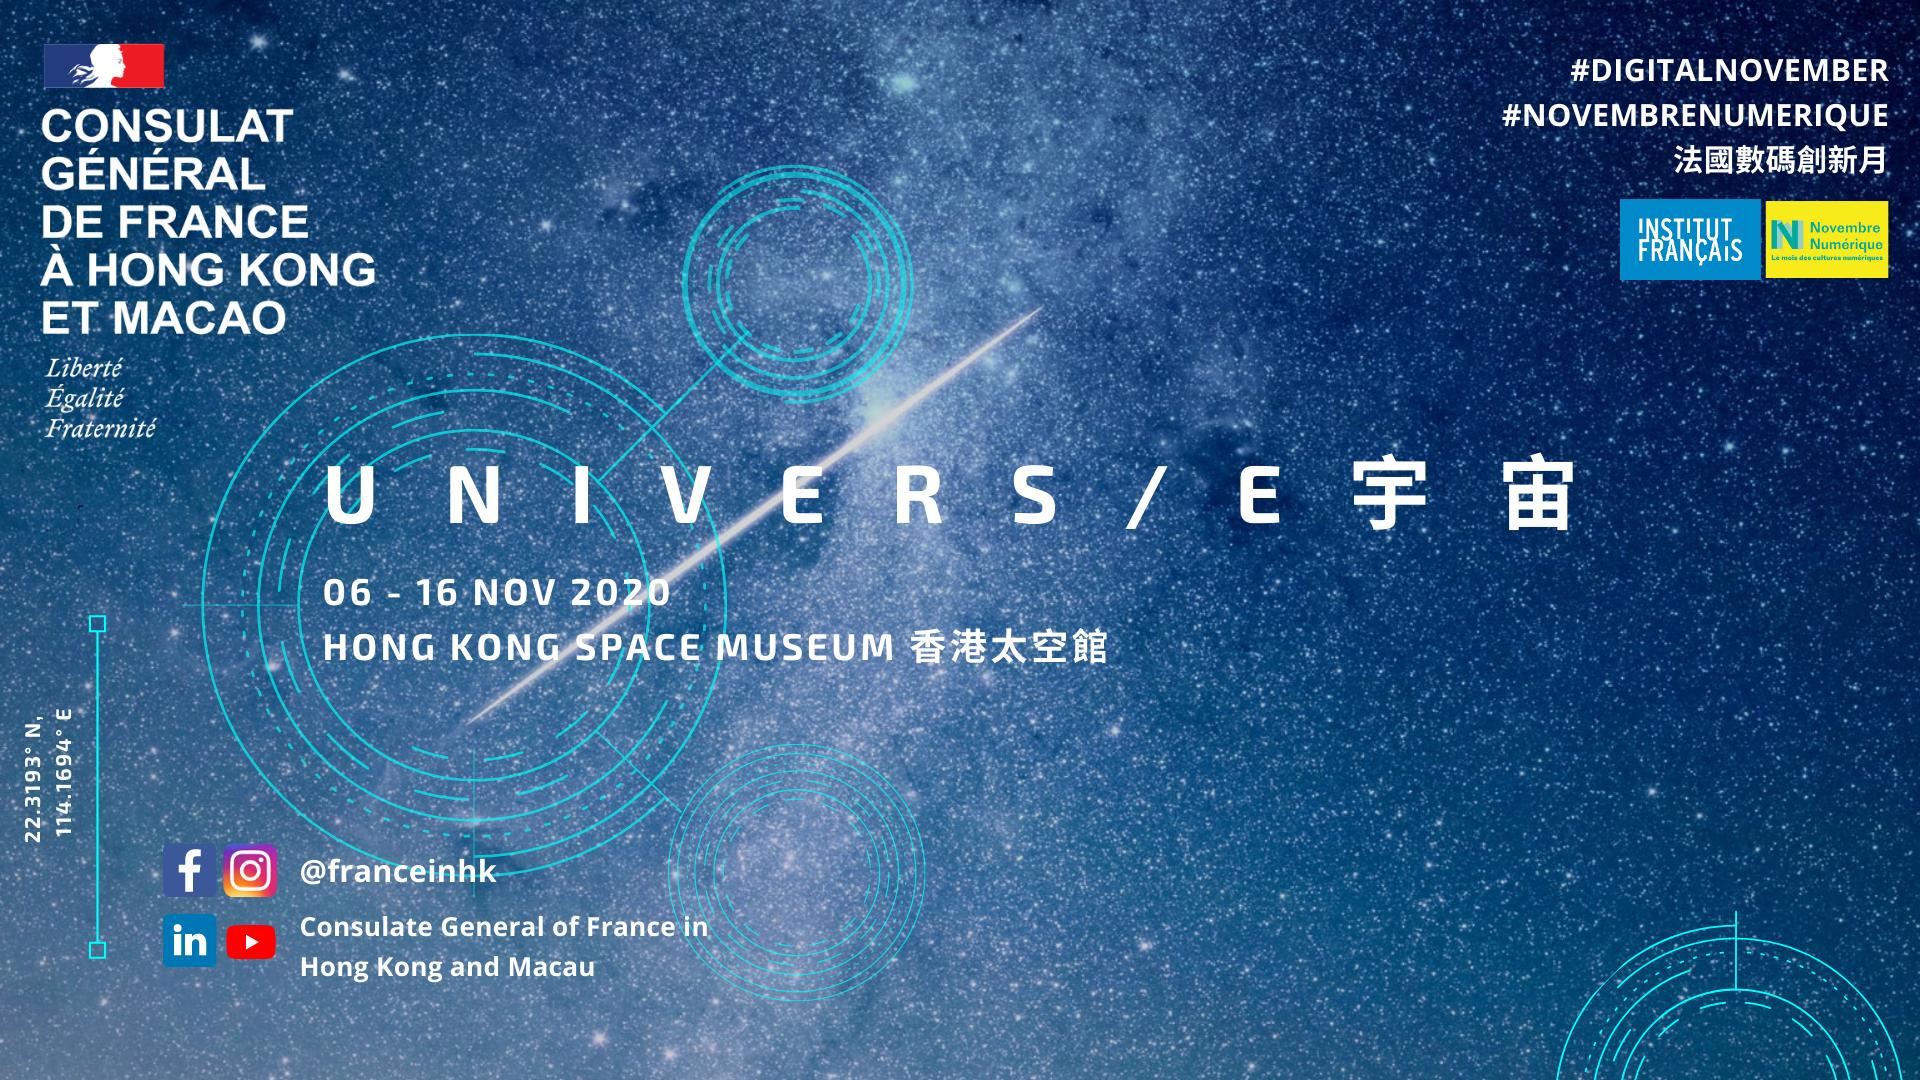 Digital November 2020 Novembre Numerique Univers E Is Landing In Hong Consulat General De France A Hong Kong Et Macao